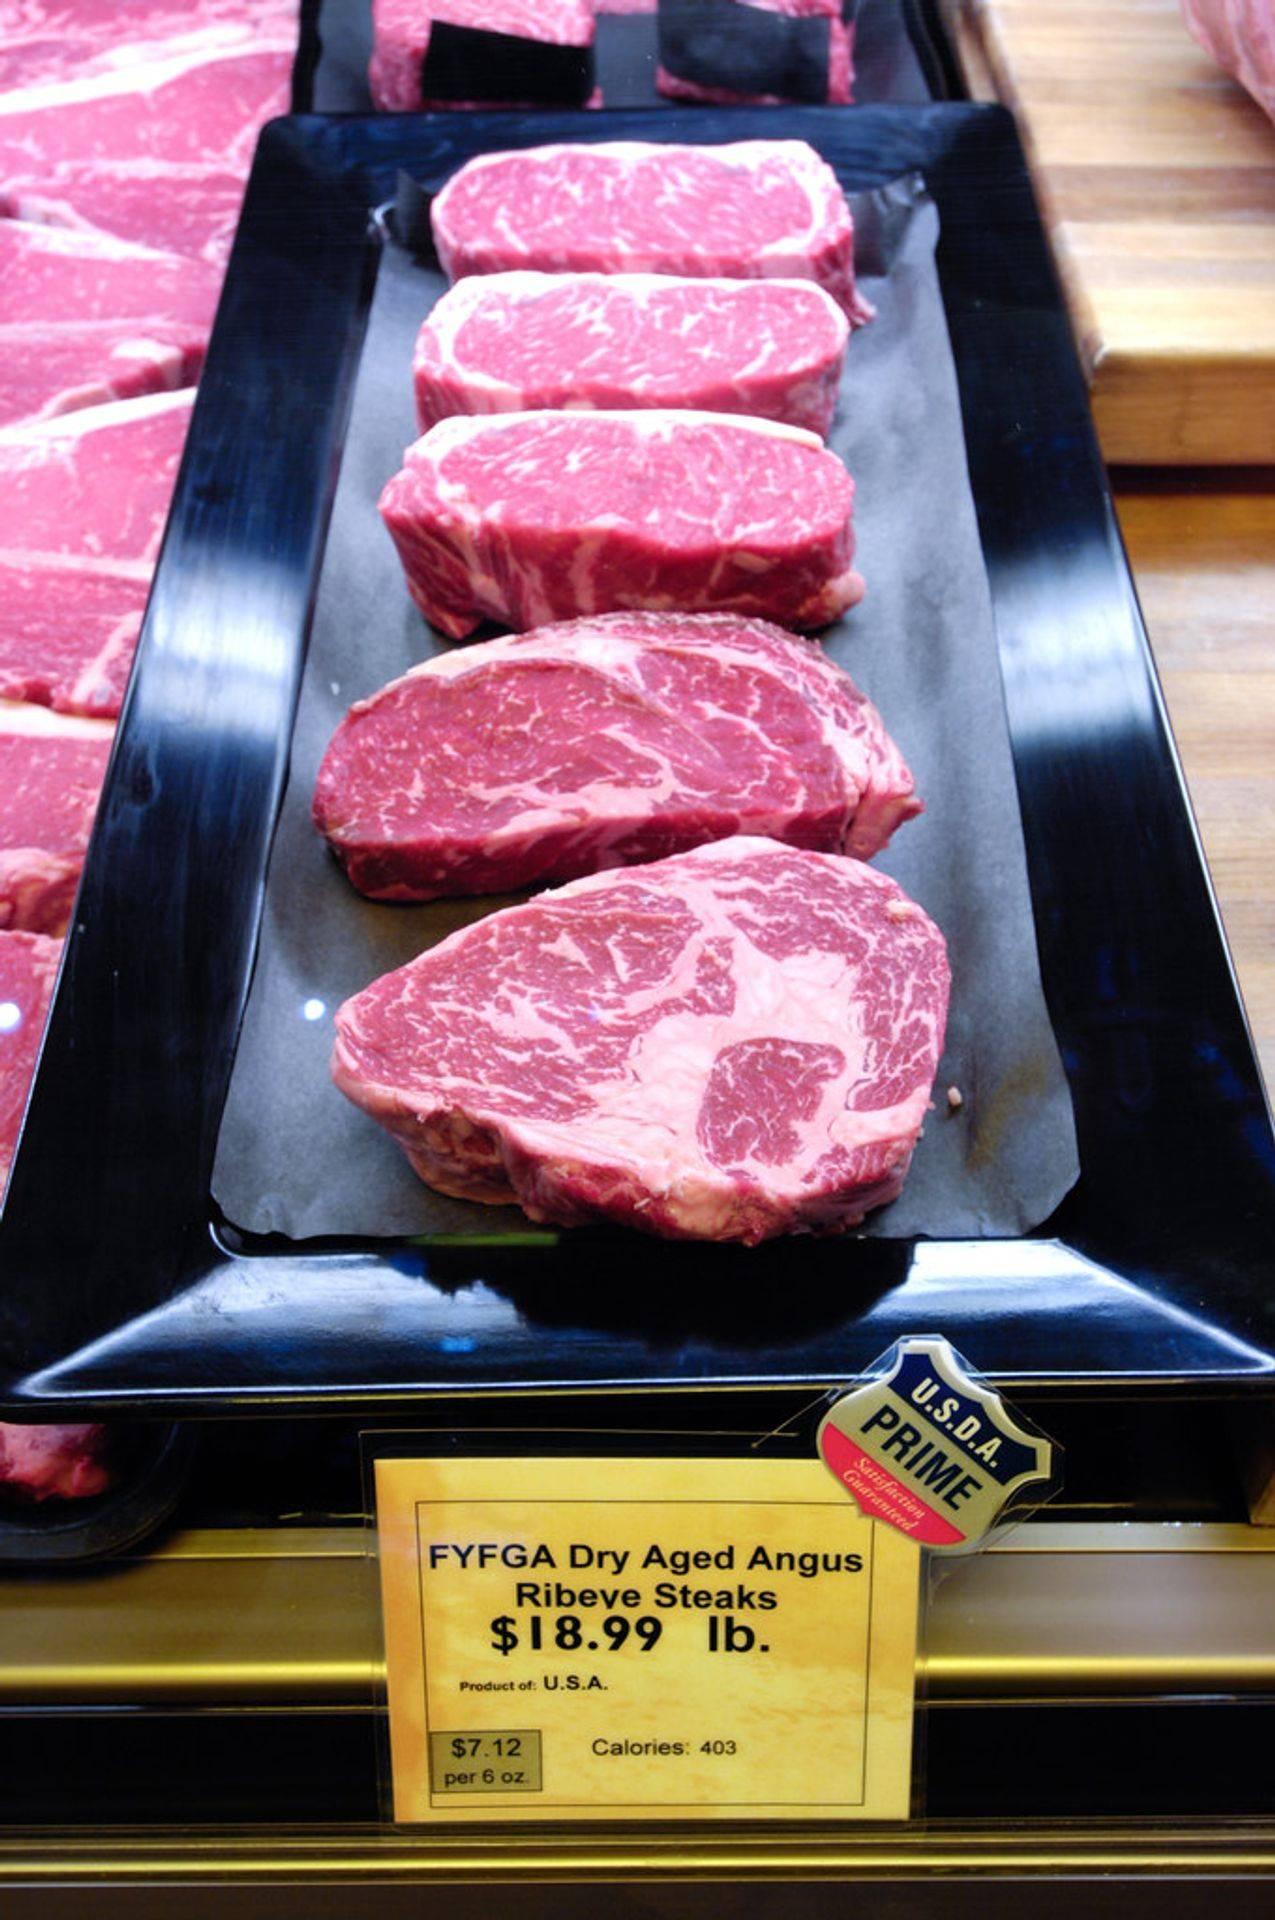 Global supplier of Buffalo Meat & Offals.